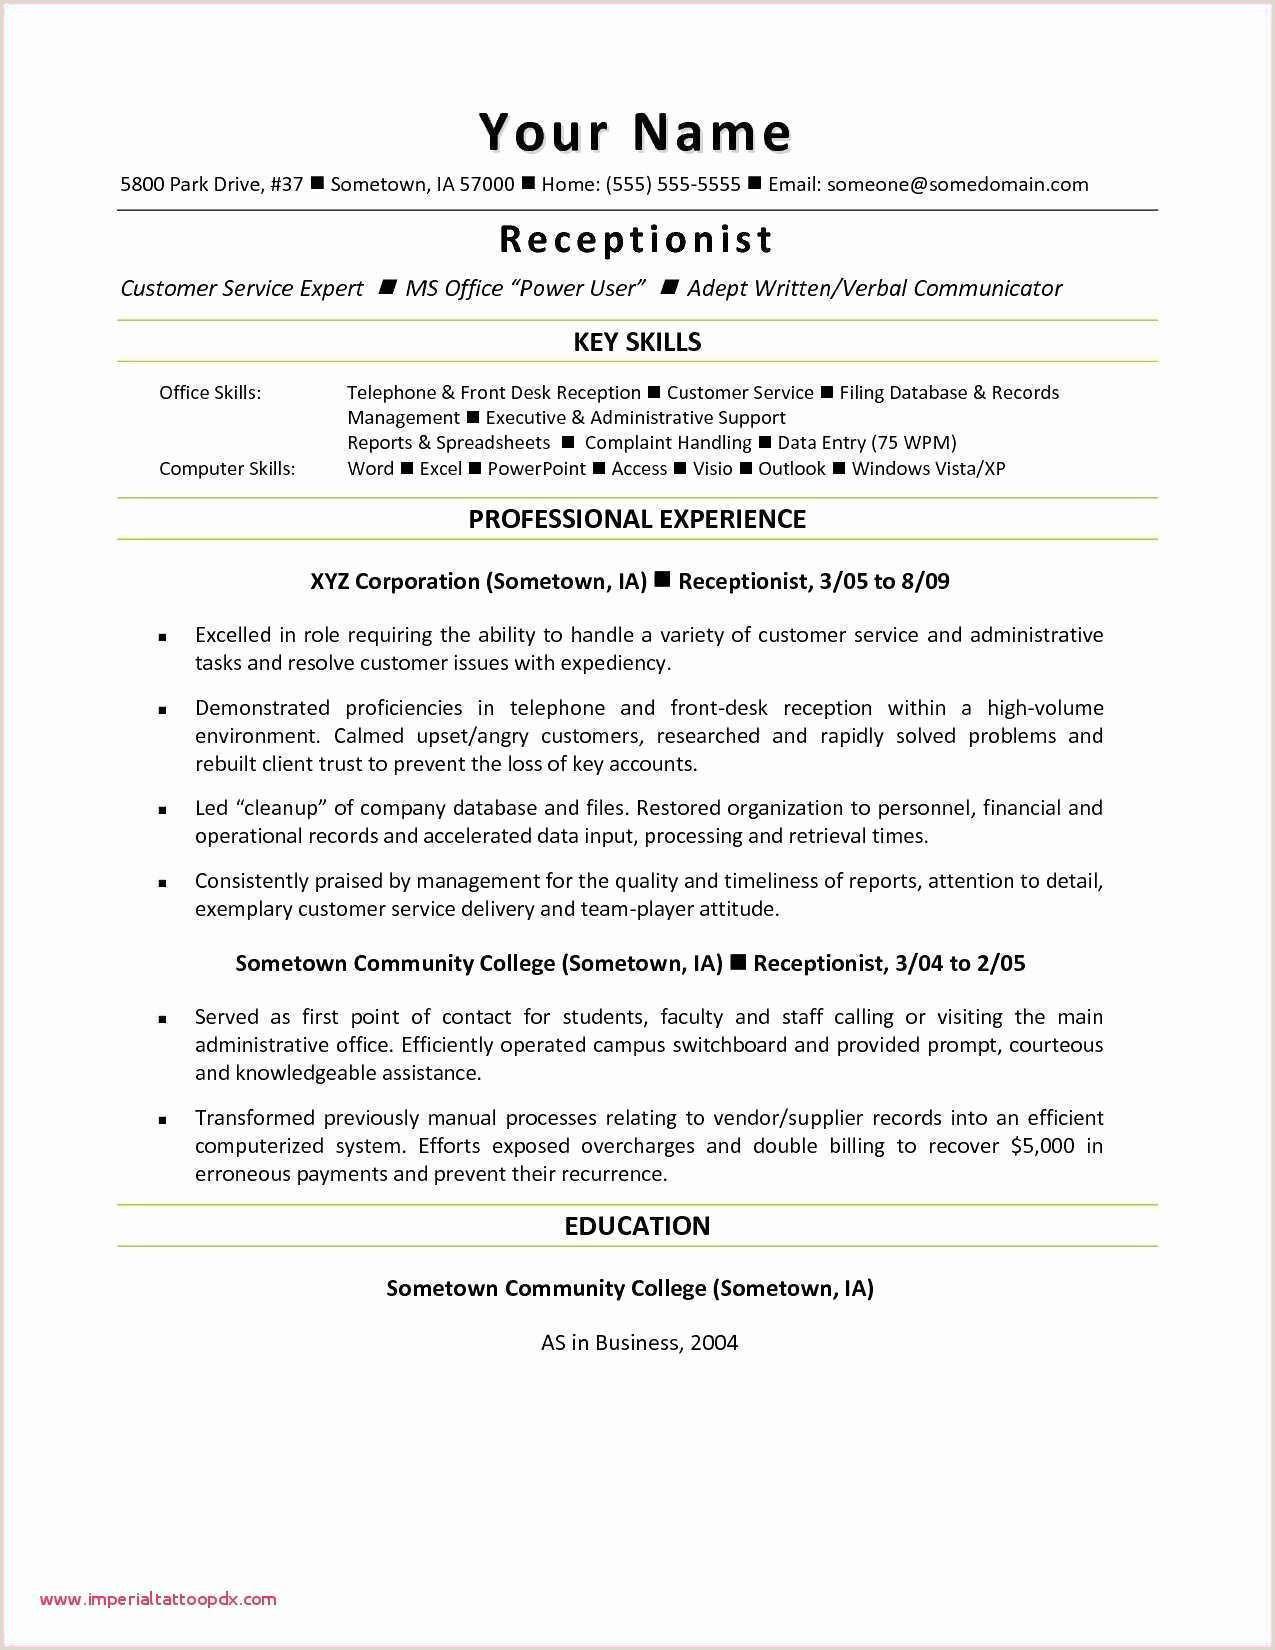 Construction Management Resume – Kizi games